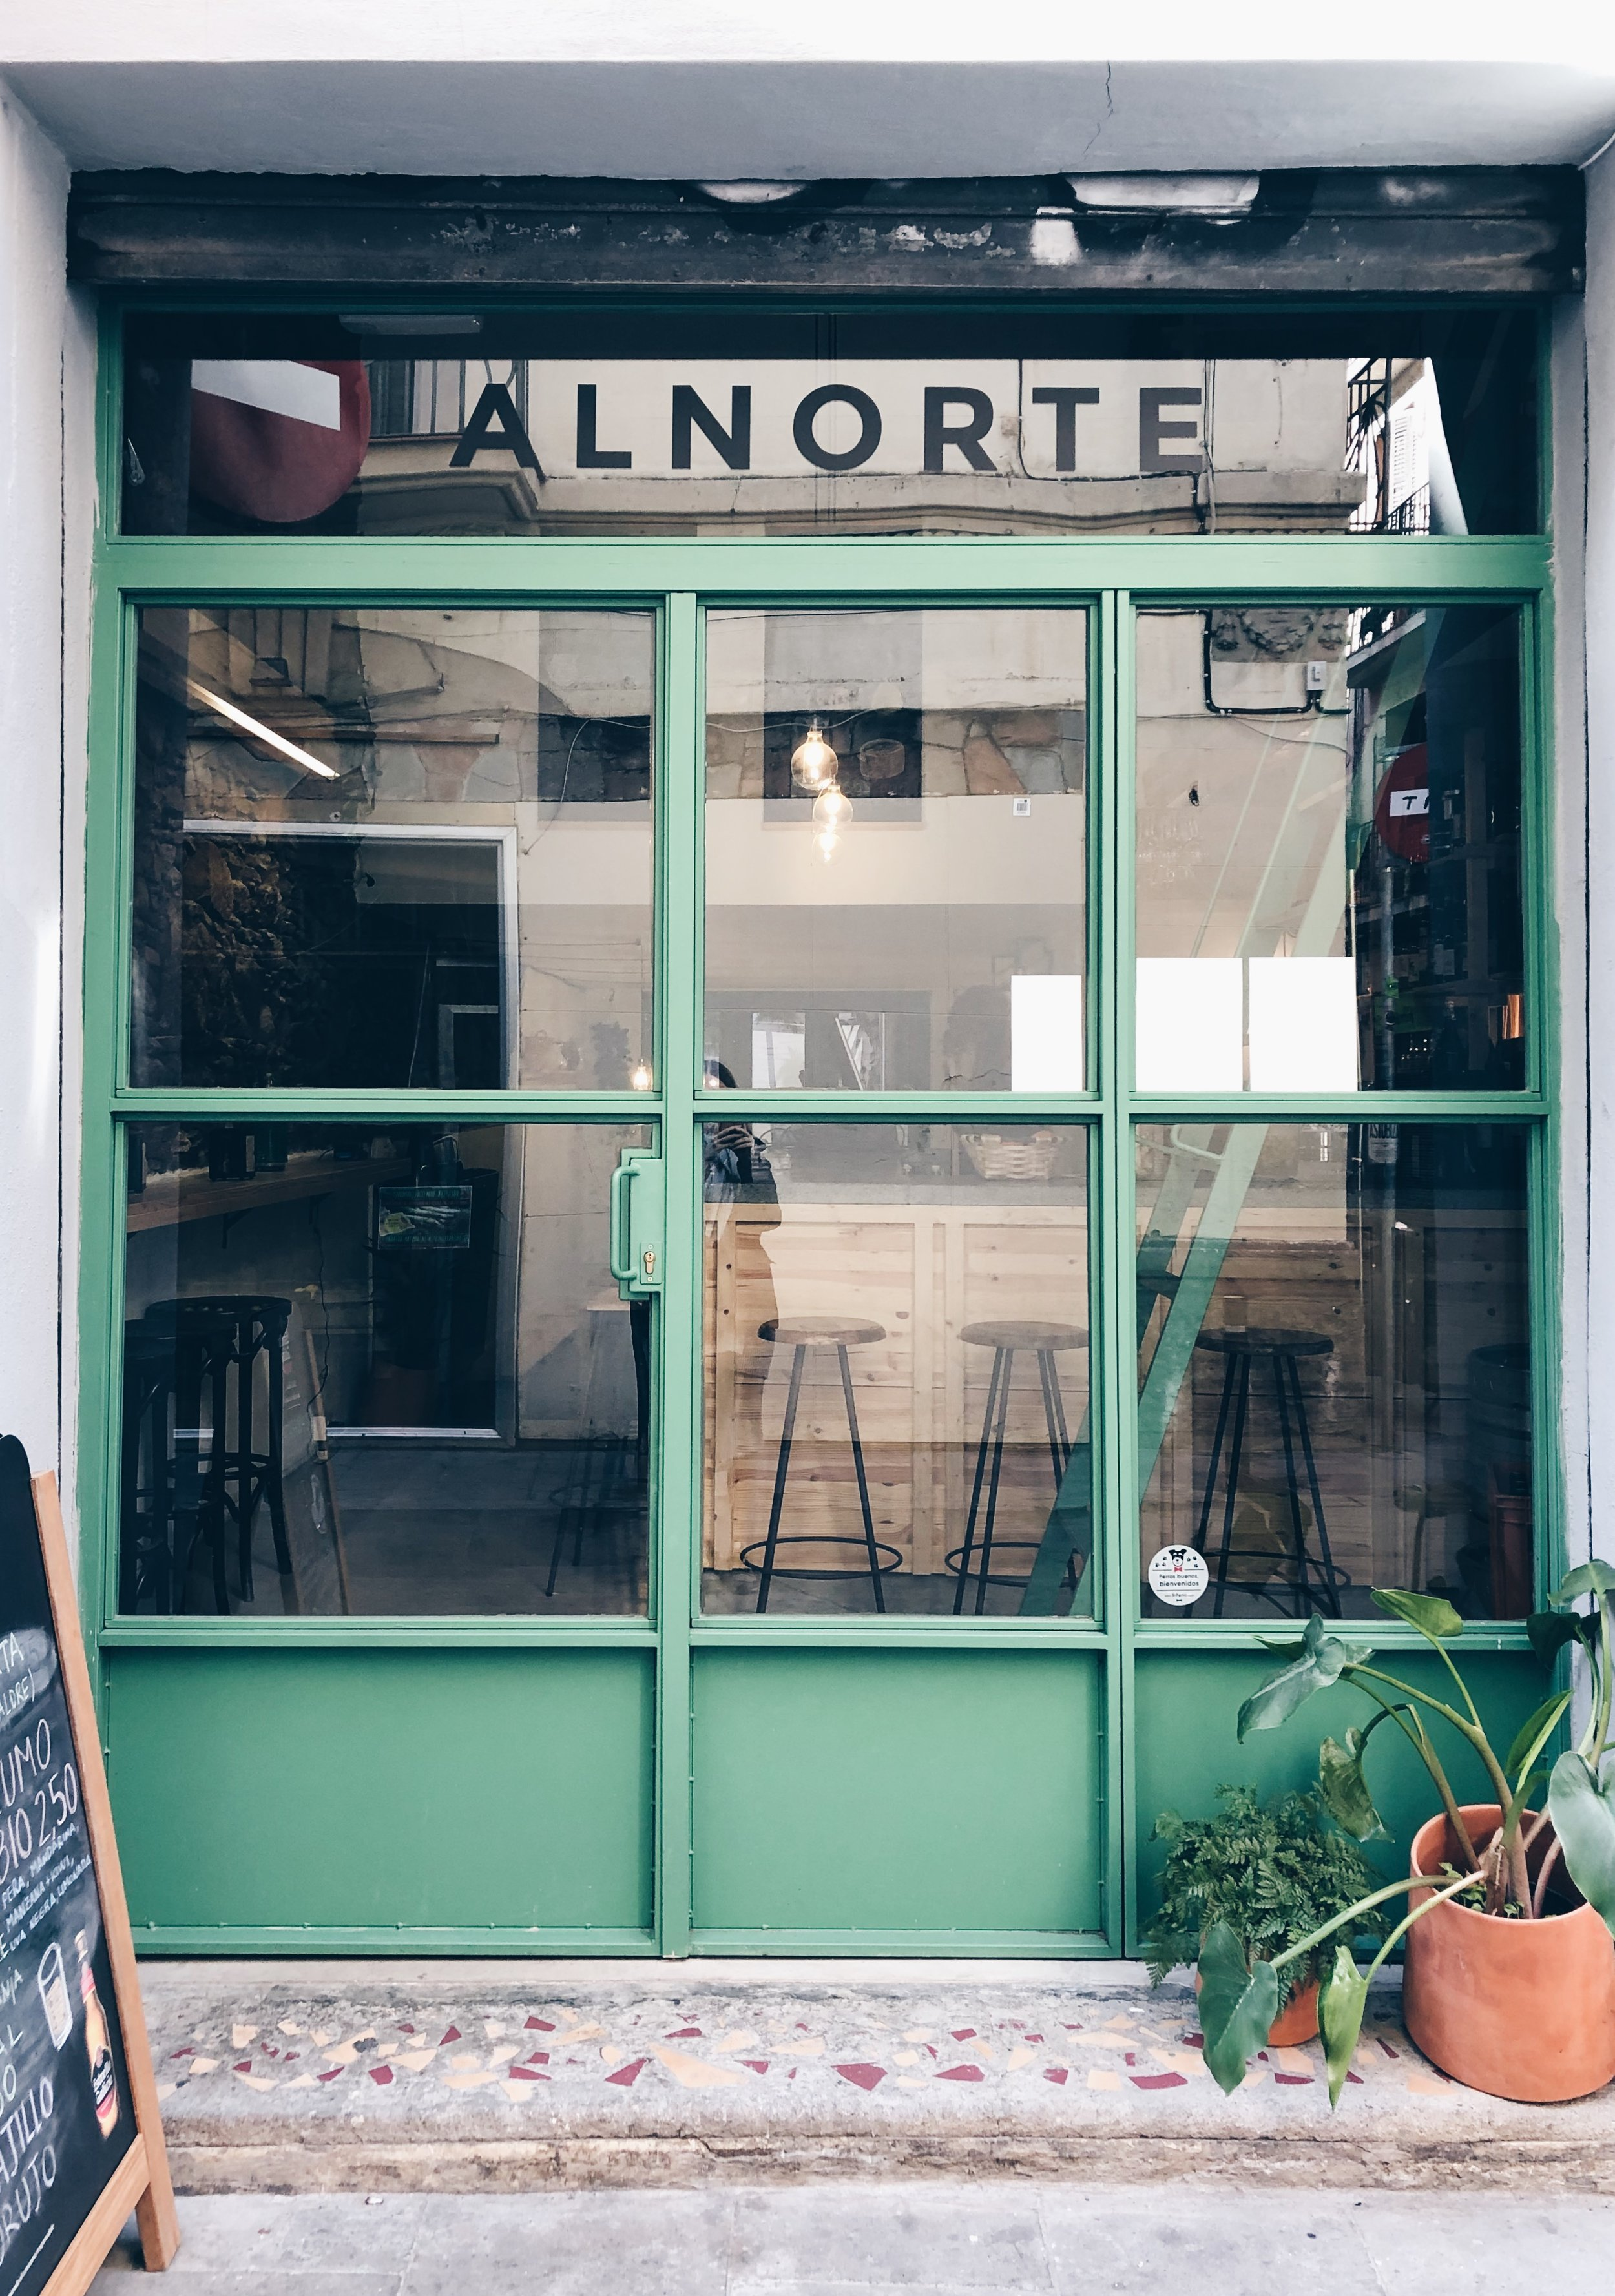 Alnorte, Gracia, Barcelona